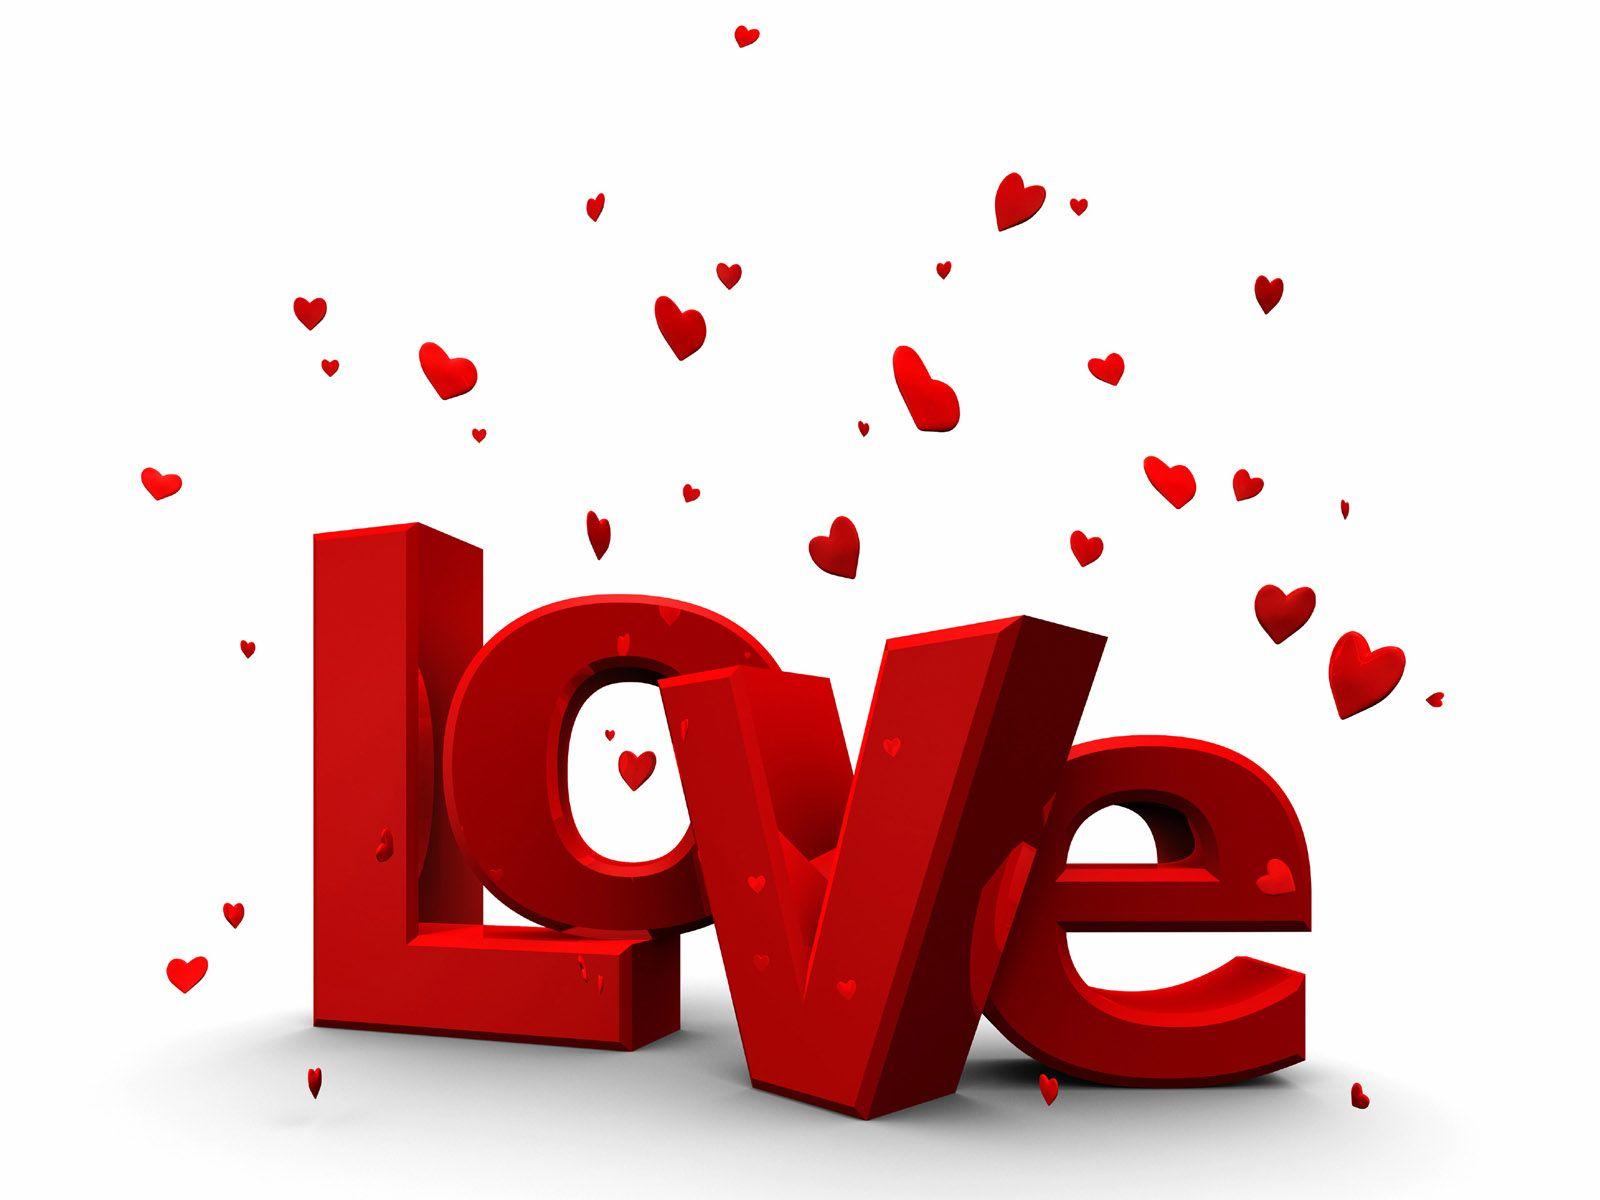 Hd wallpaper i love you - Highres 3d Name Wallpaper I Love You With Hd Image Wallpapers With